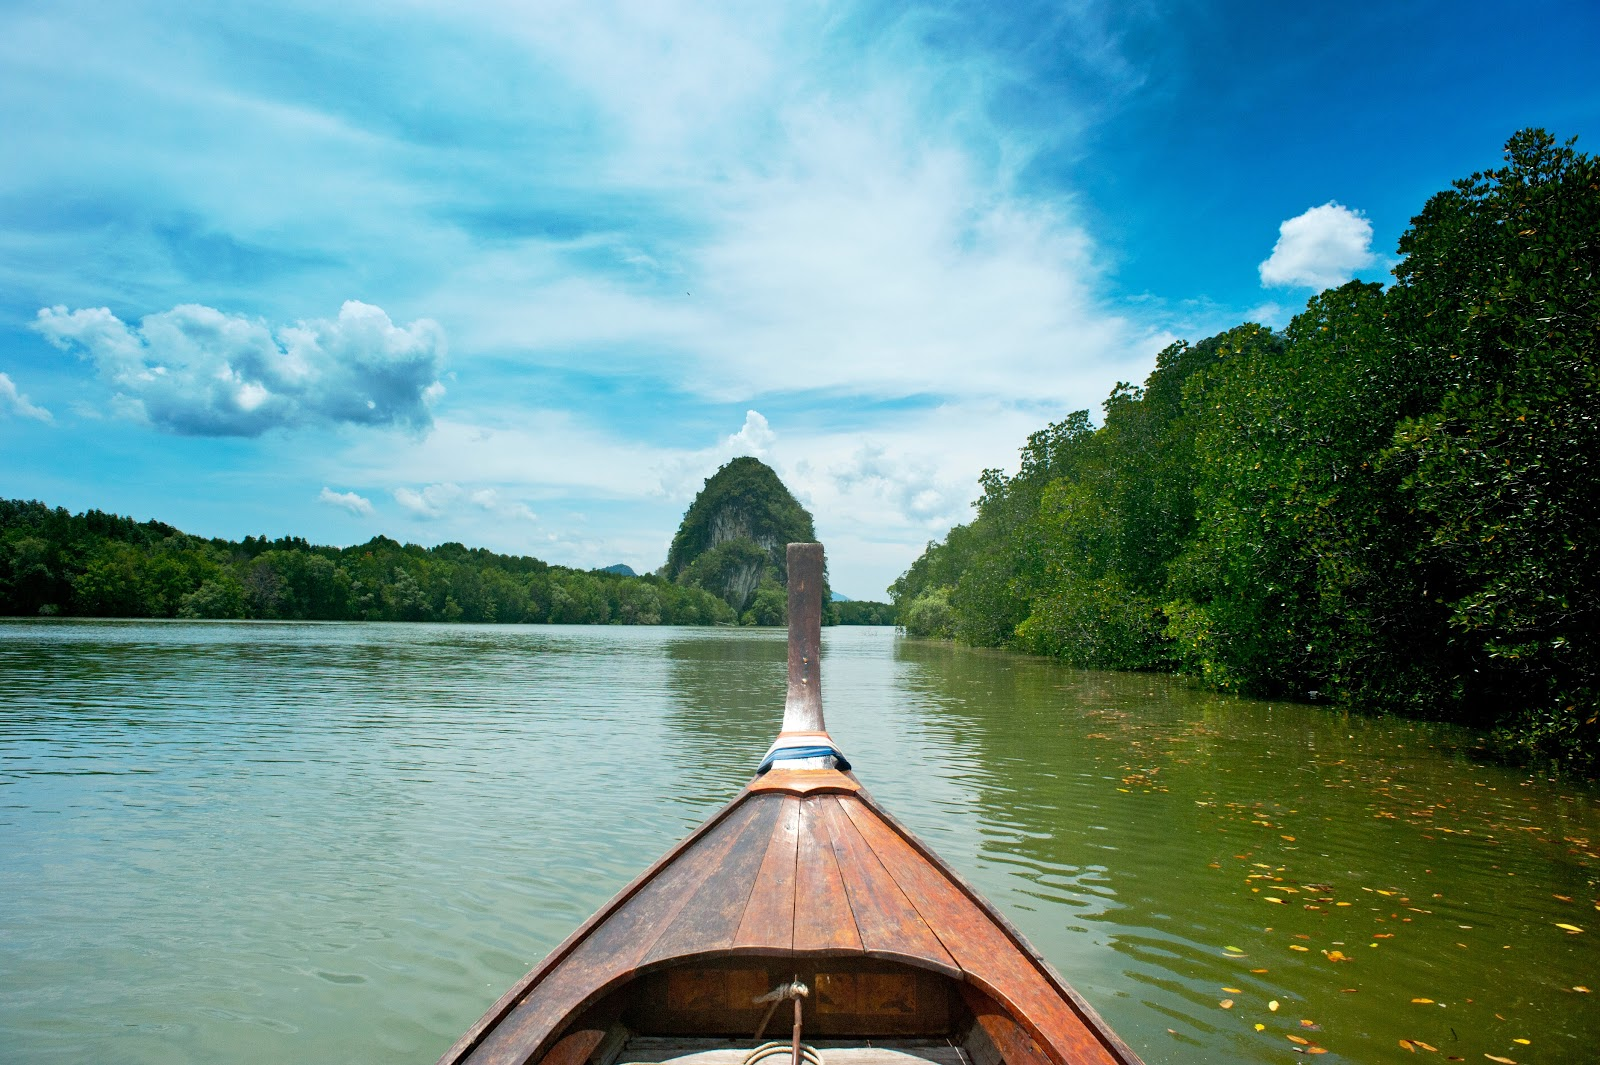 brown-wooden-canoe-near-trees-1031798 (1)